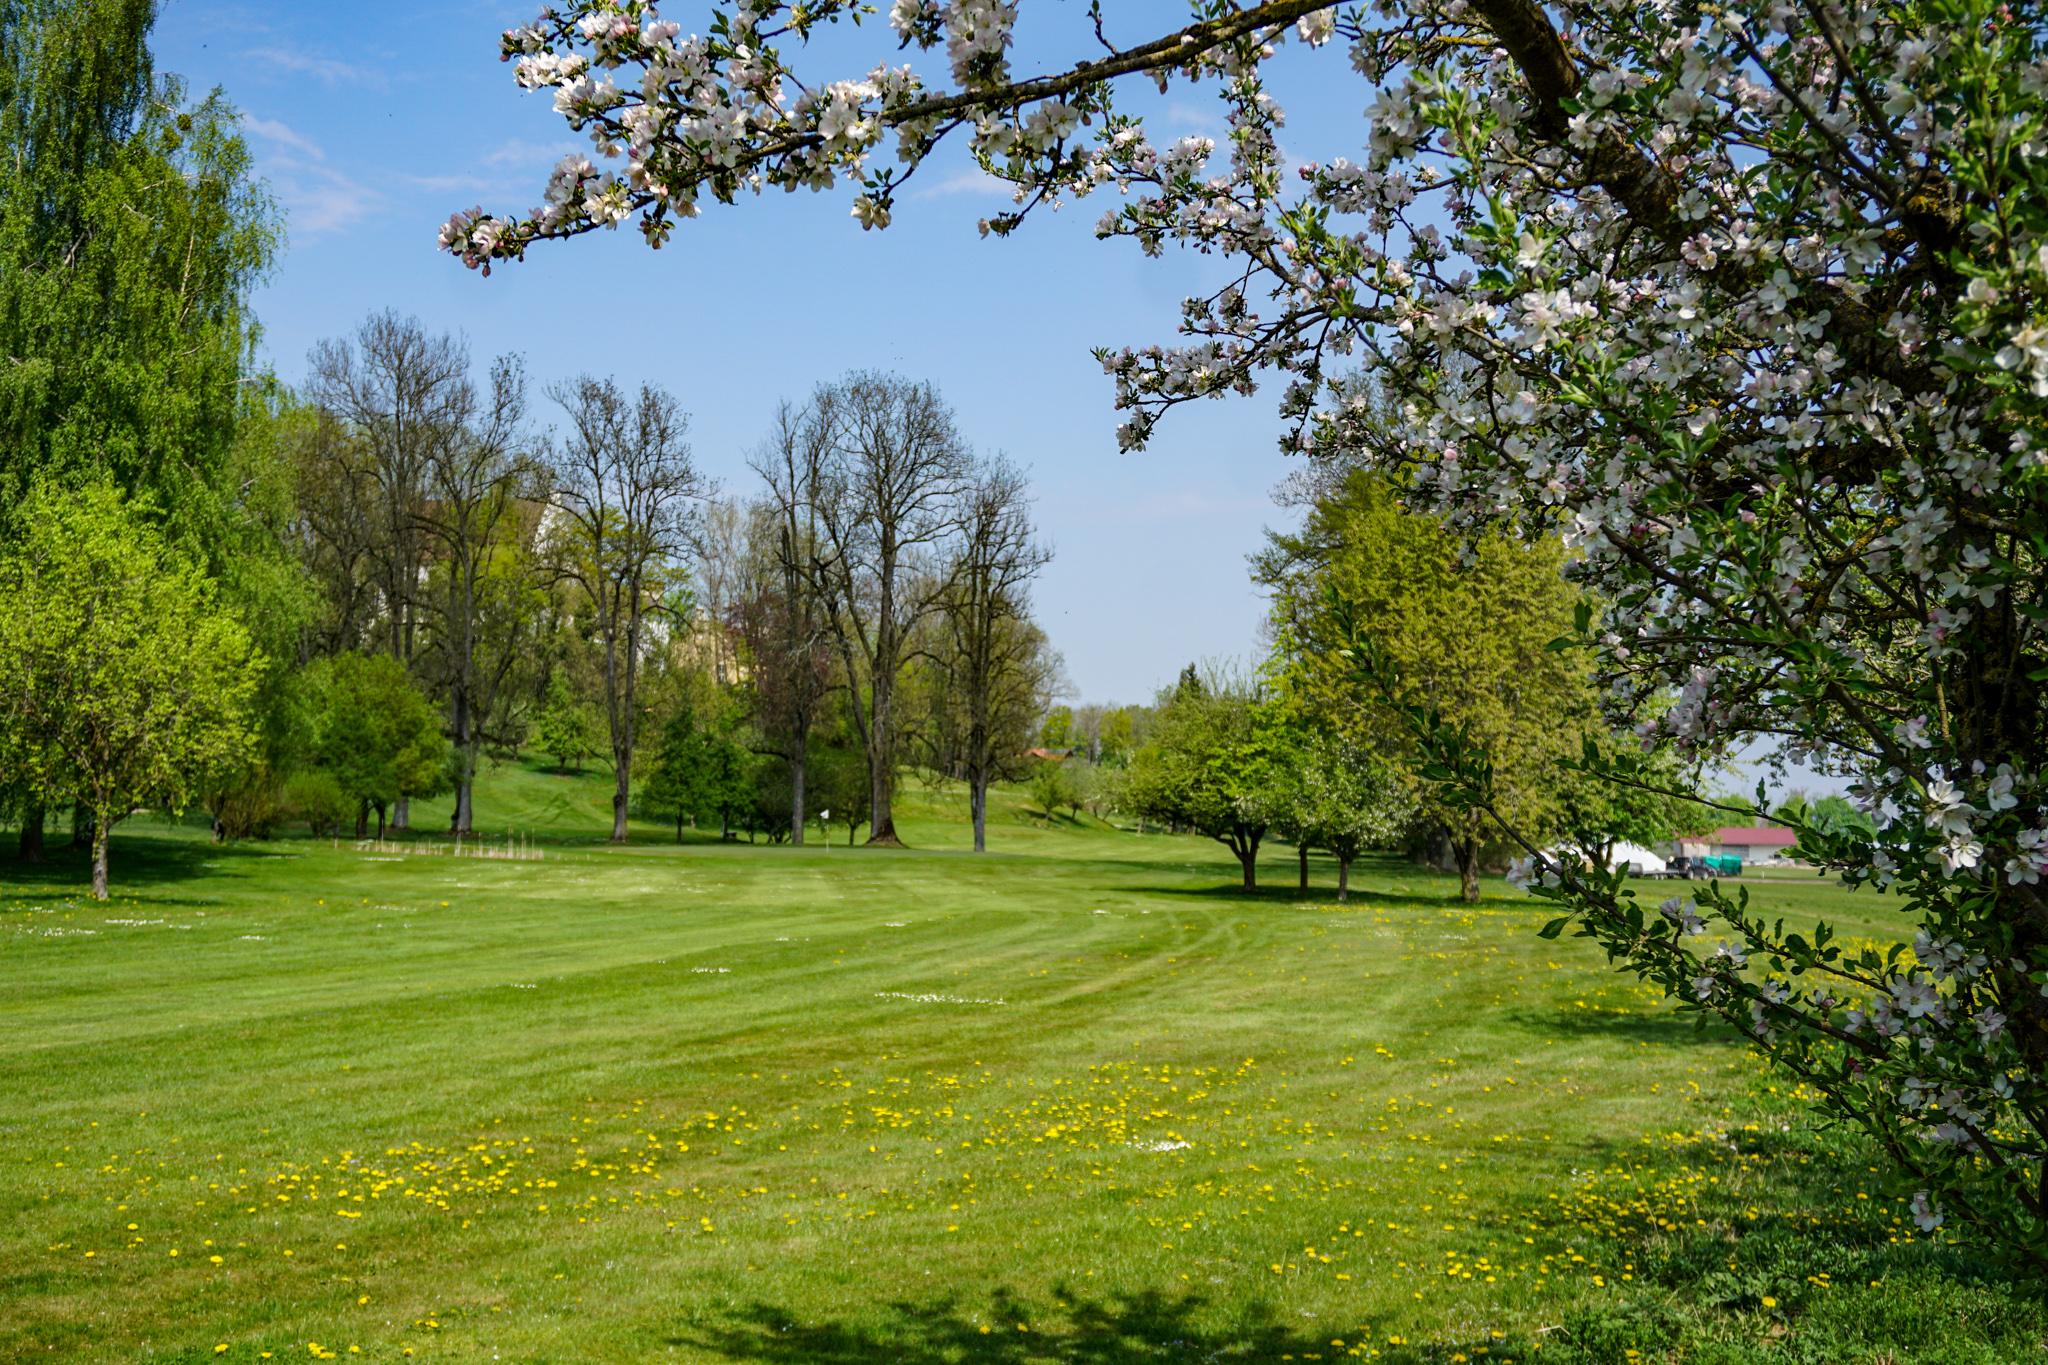 Golfclub Schloss Igling Bahn 6/15